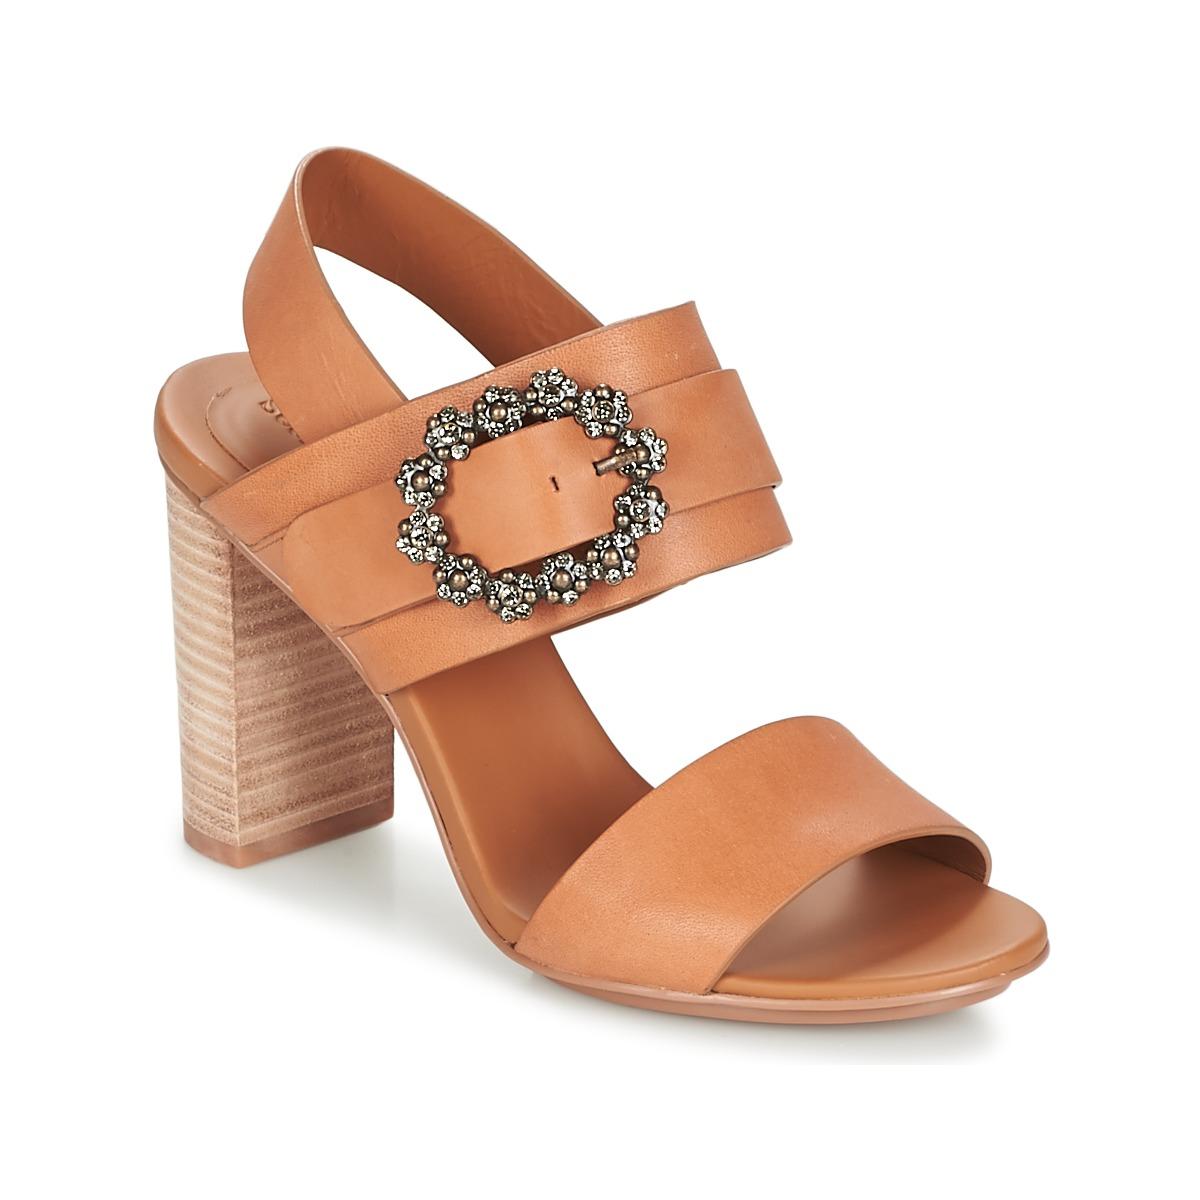 See by Chloé SB30123 Camel - Kostenloser Versand bei Spartoode ! - Schuhe Sandalen / Sandaletten Damen 206,50 €